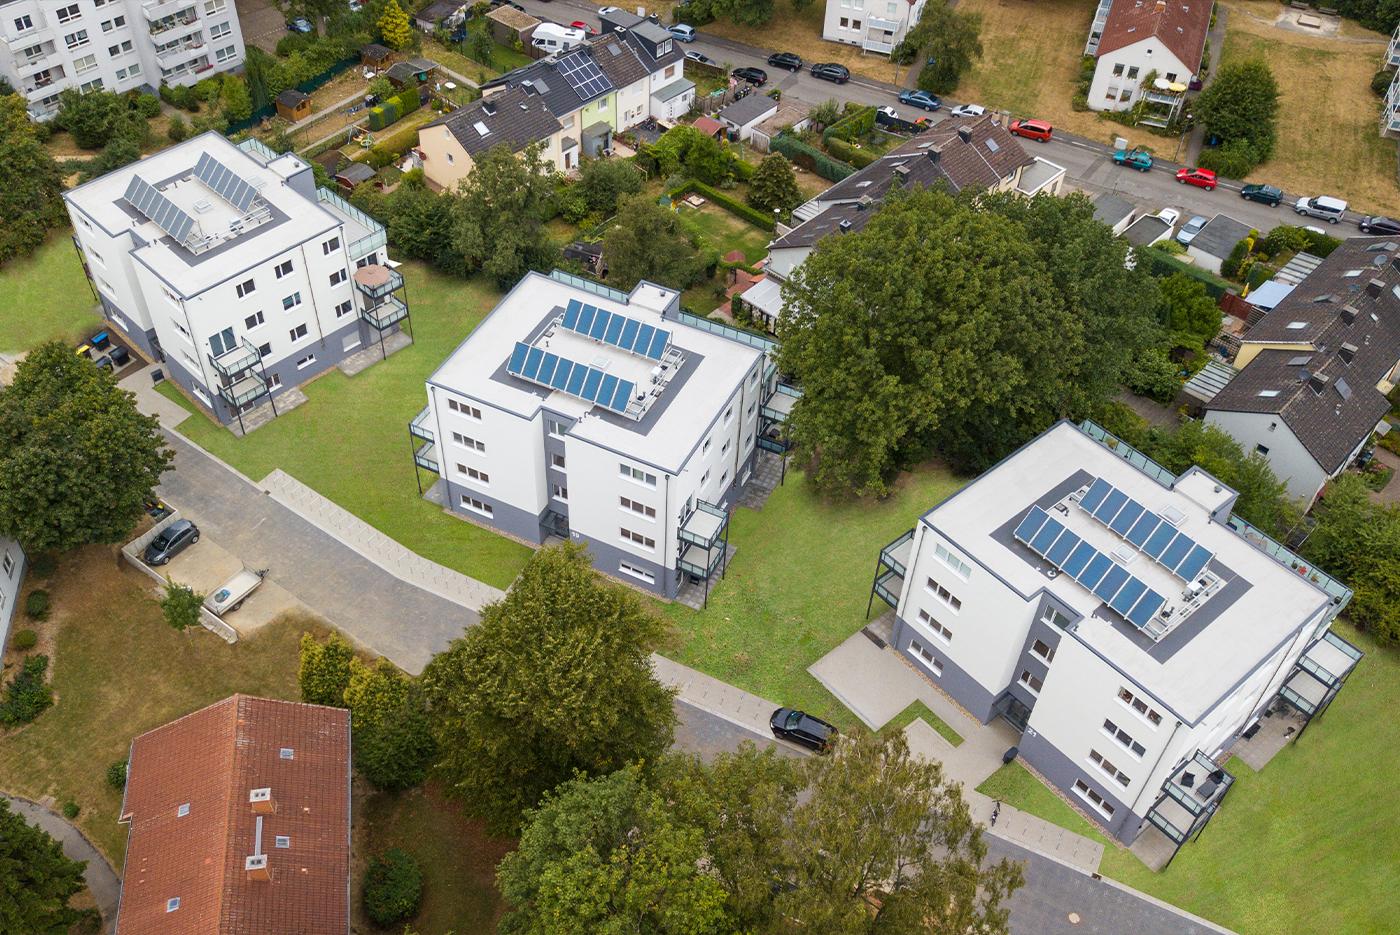 Modular Multi-Storey Apartment Building in Bochum, Germany ...